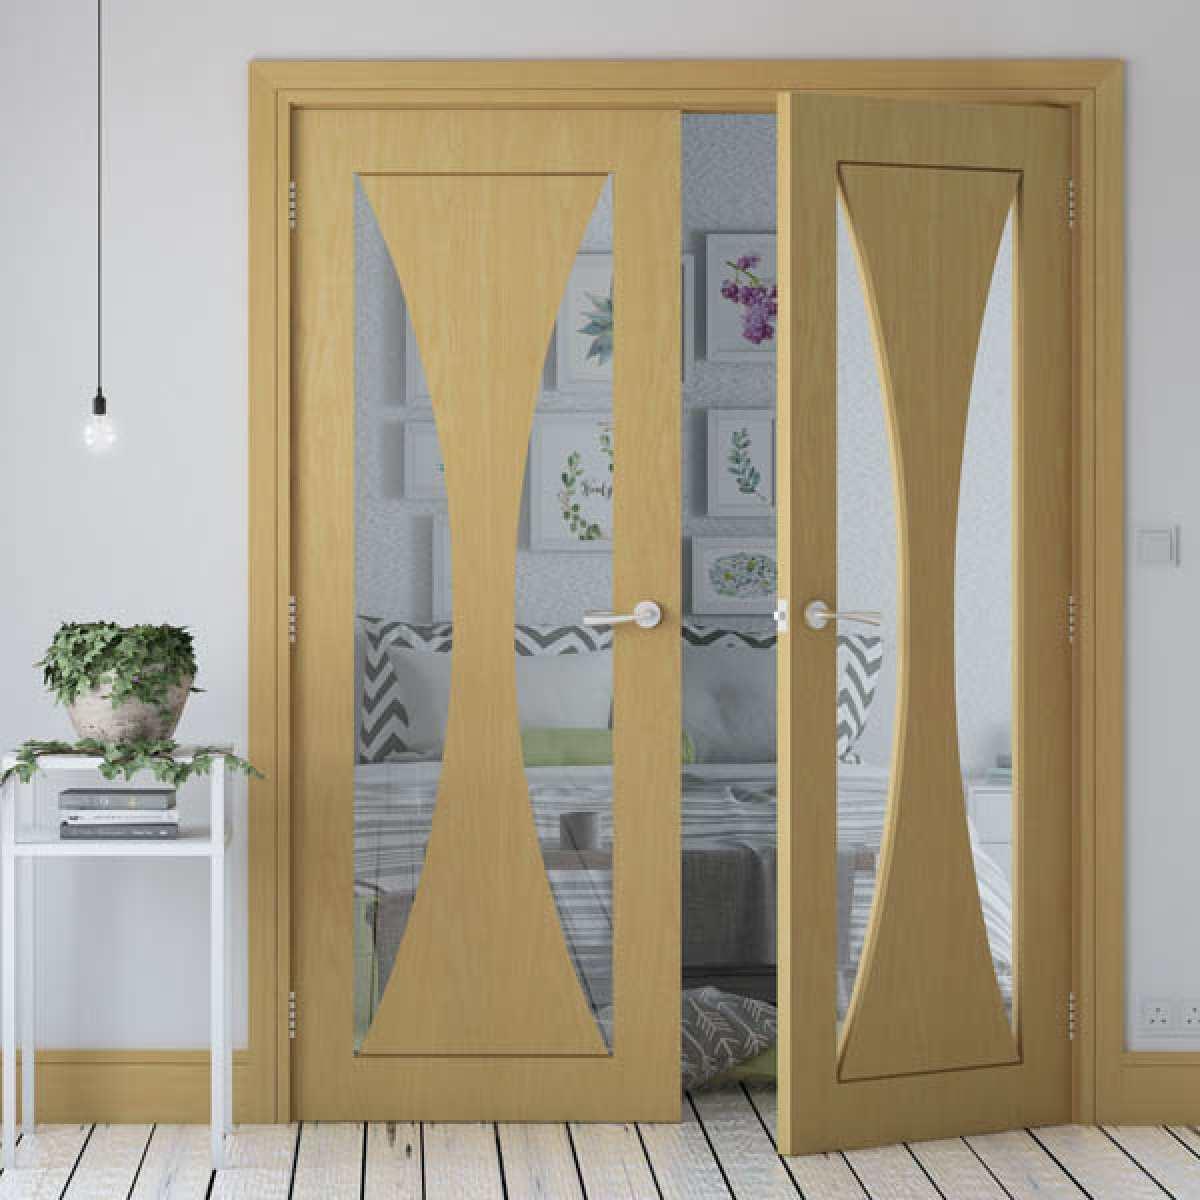 sorrento oak glazed lifestyle websters Image by Websters Timber